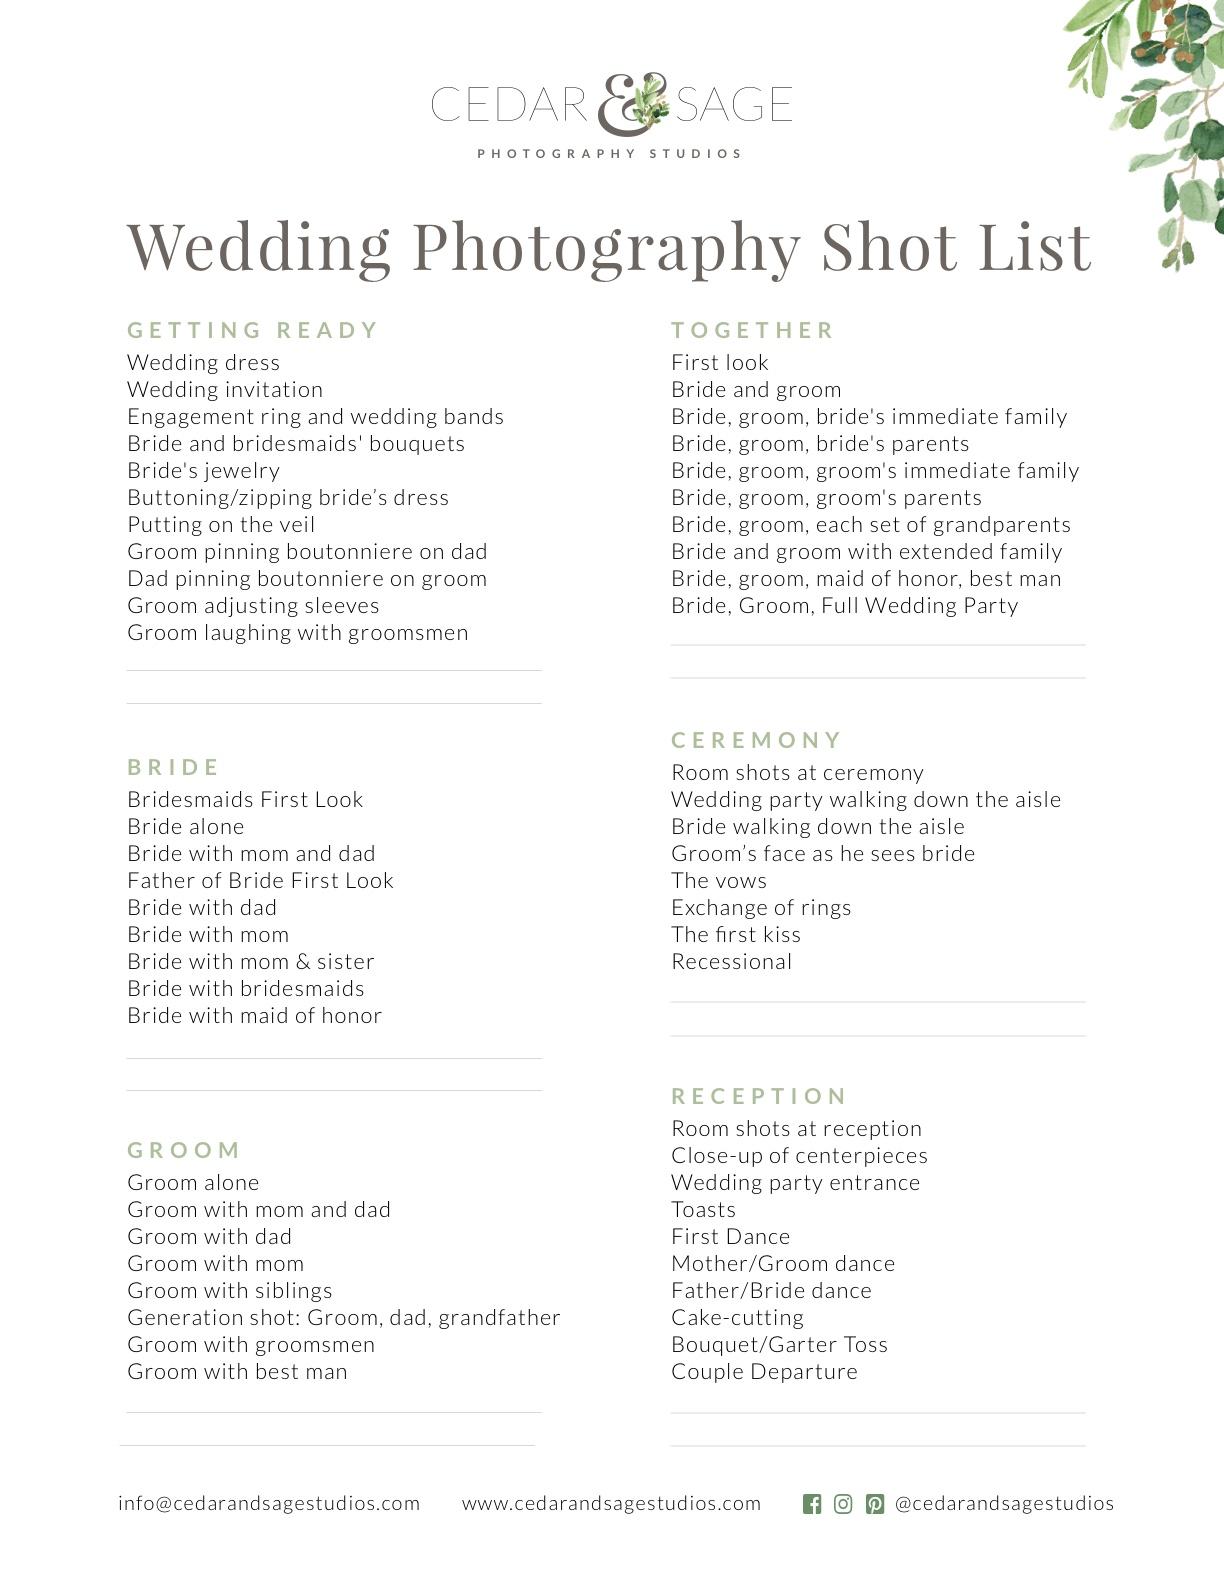 Wedding Photography Shot List In 2020 Wedding Photography Shot List Wedding Photography Checklist Wedding Photo Checklist